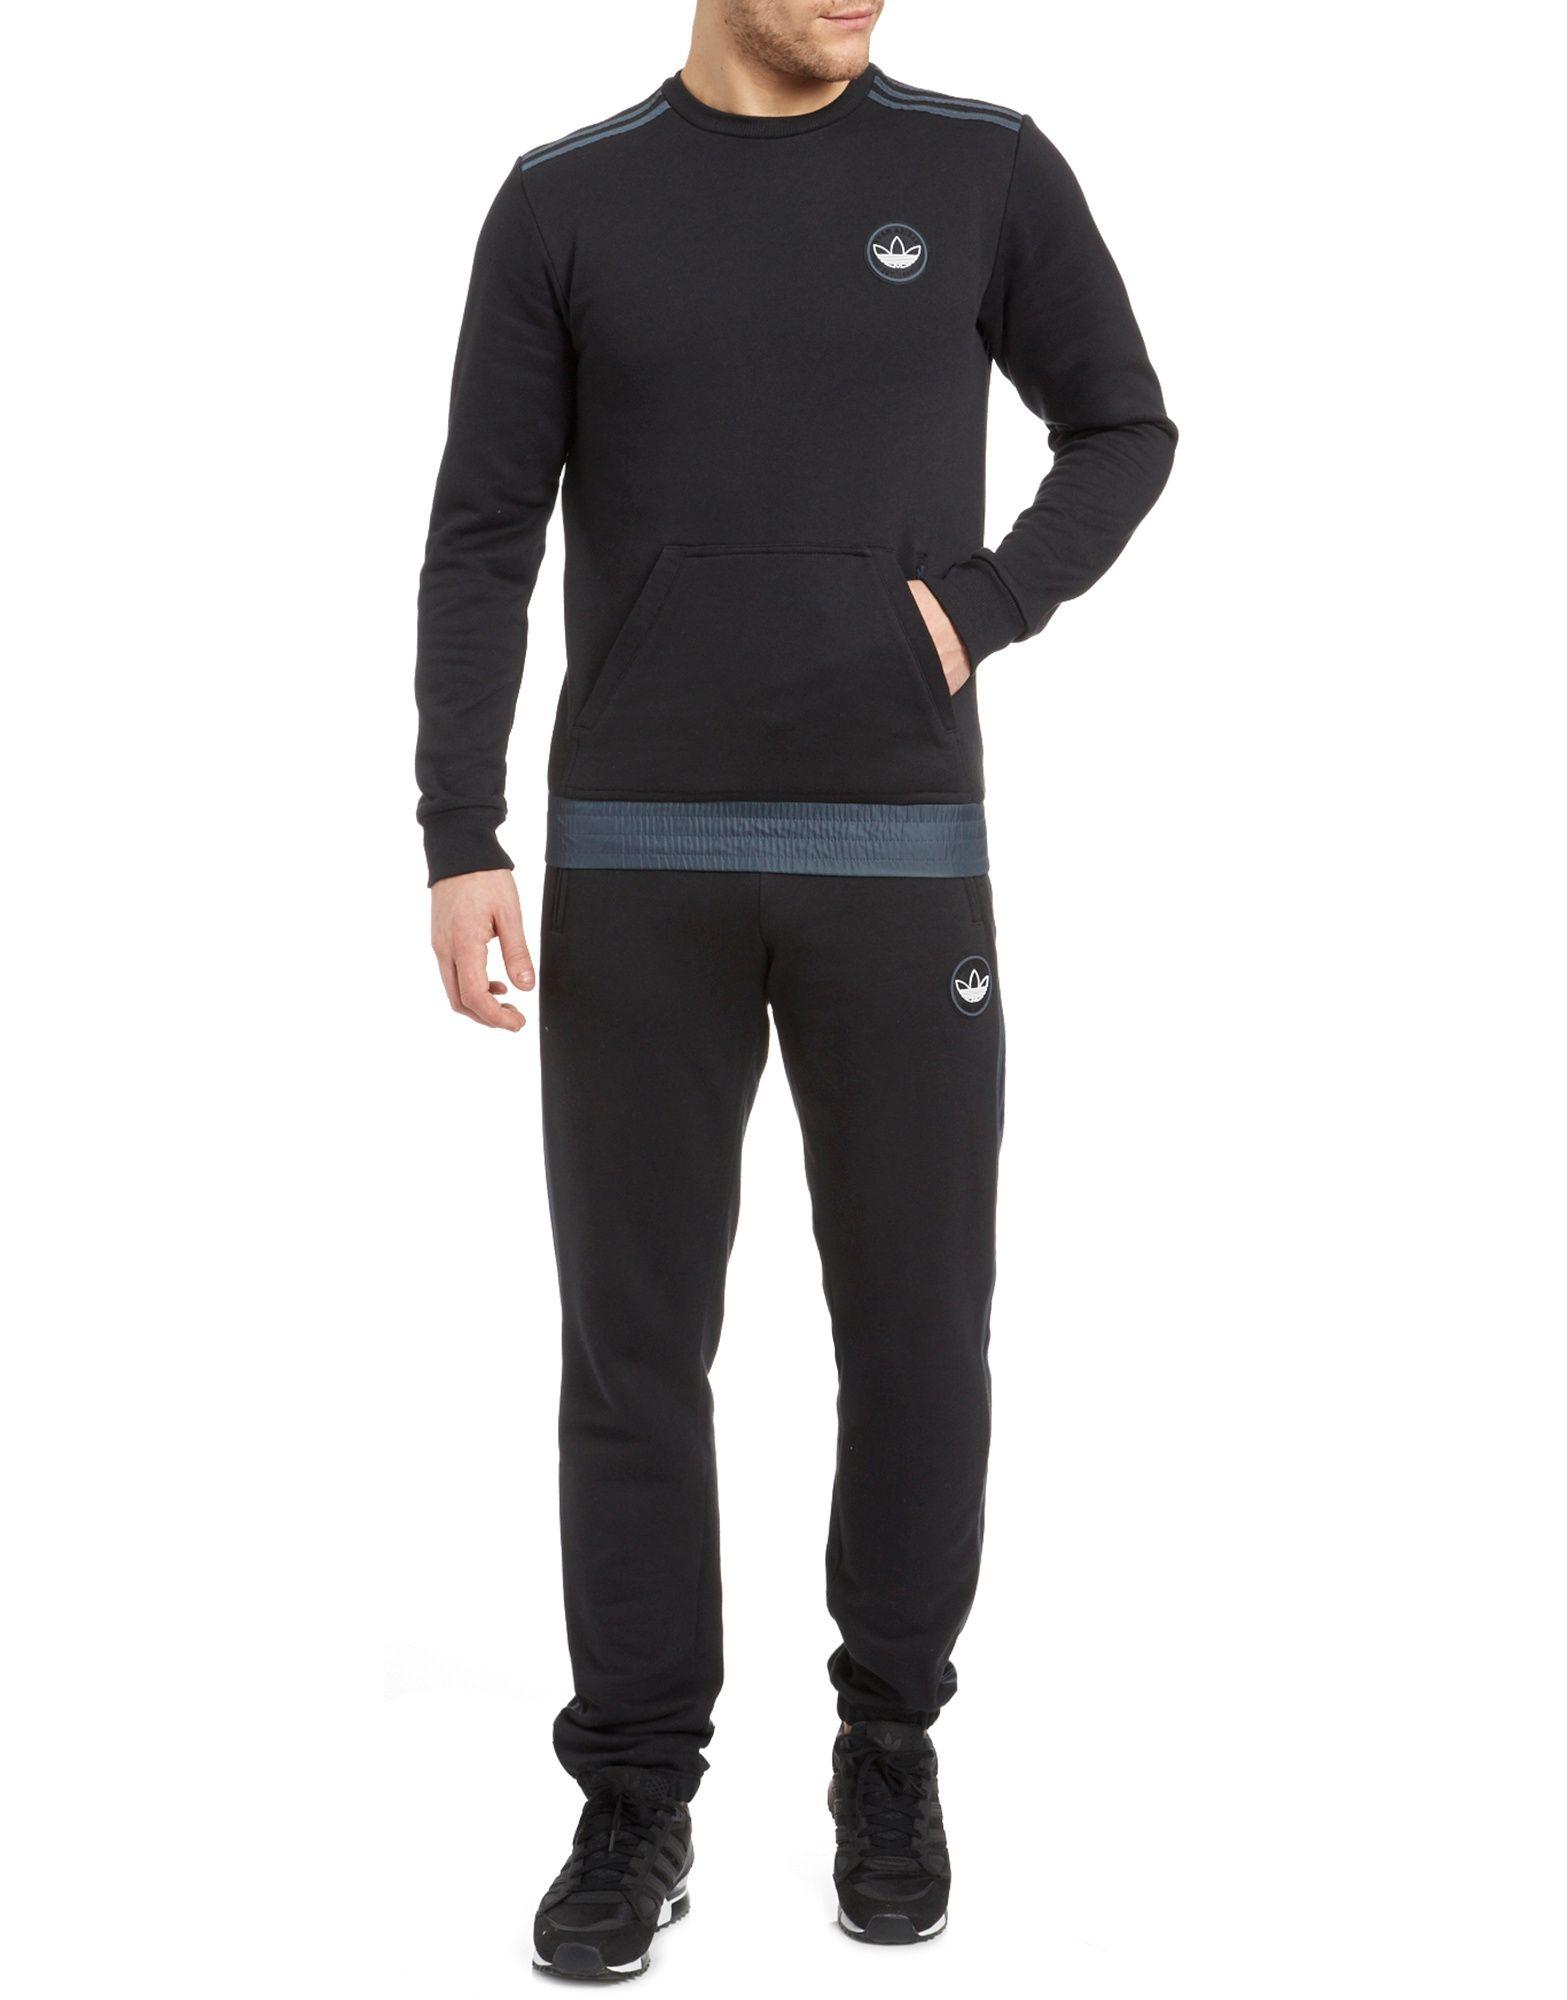 adidas Originals Team Fleece Track Pants